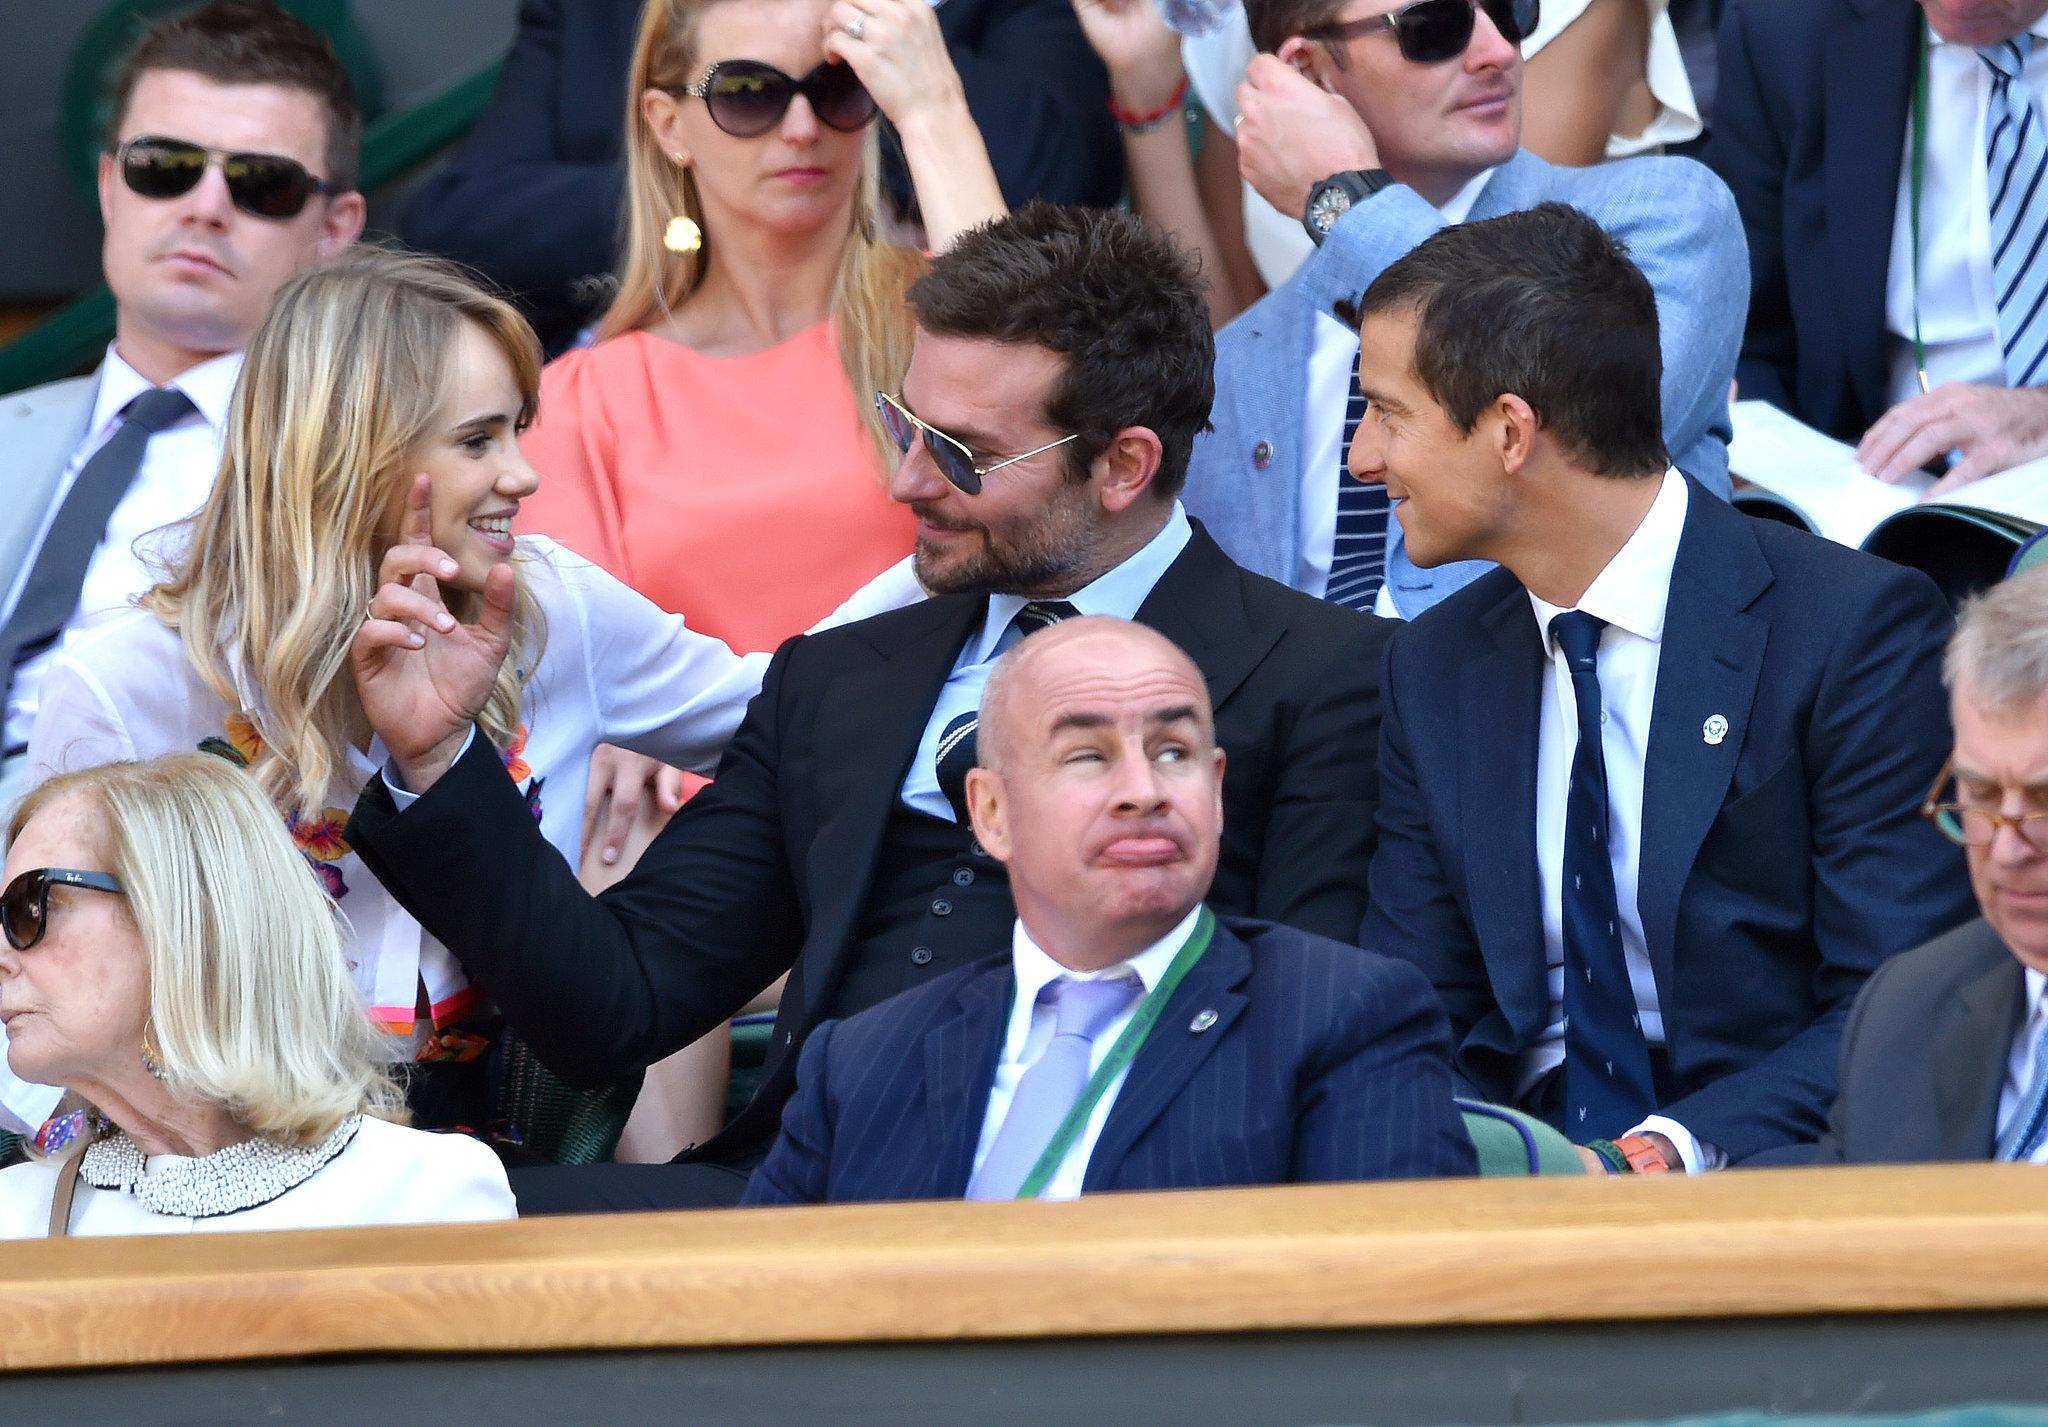 Bradley Cooper and Suki Waterhouse got adorable at the semifinal match between Novak Djokovic and Grigor Dimitrov.